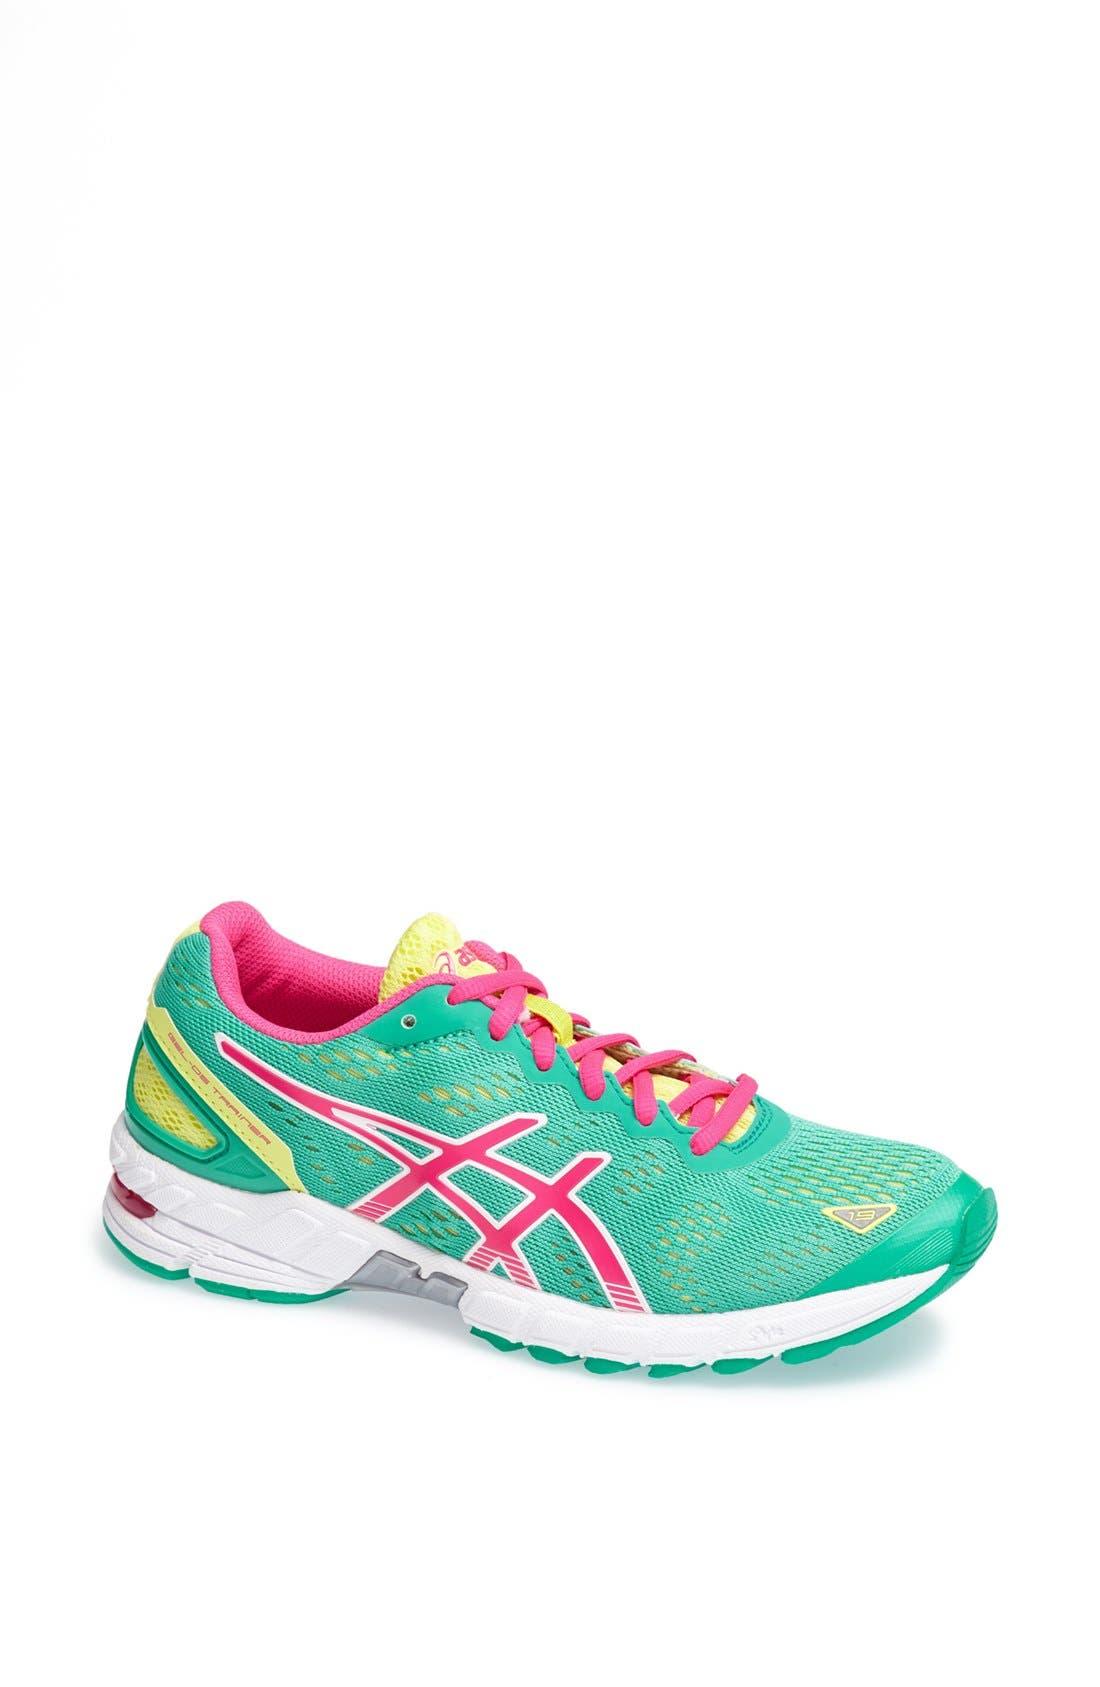 Main Image - ASICS® 'GEL-DS Trainer19' Running Shoe (Women)